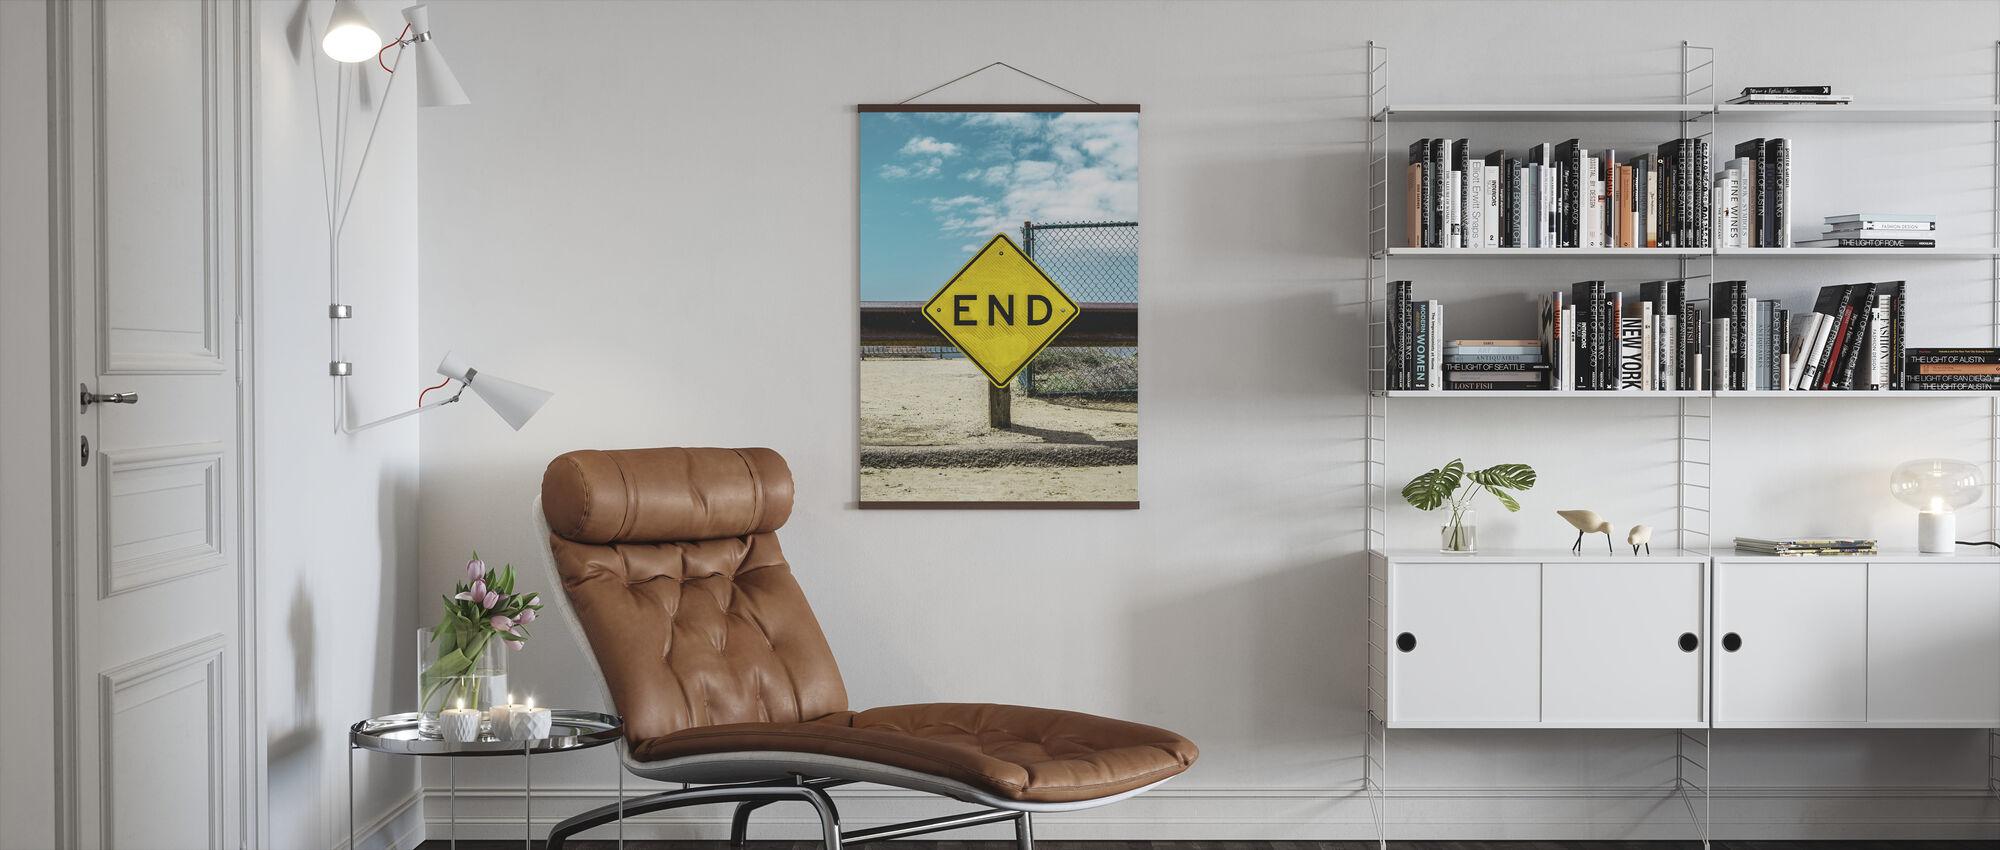 Avslutt Sign - Plakat - Stue